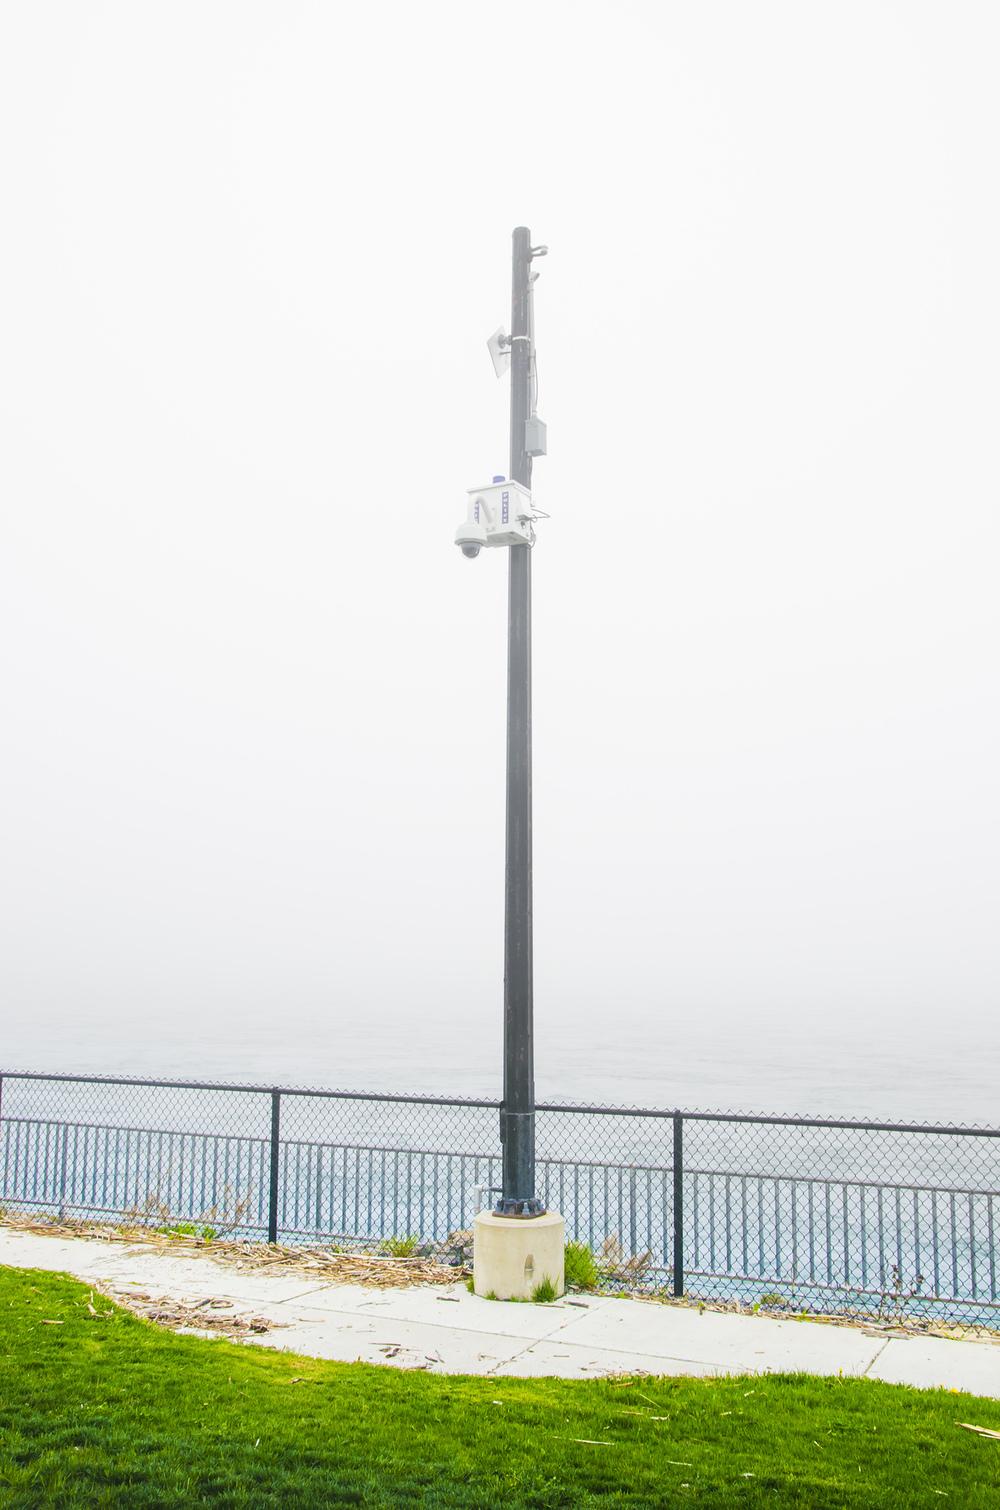 Broderick Park Surveillance